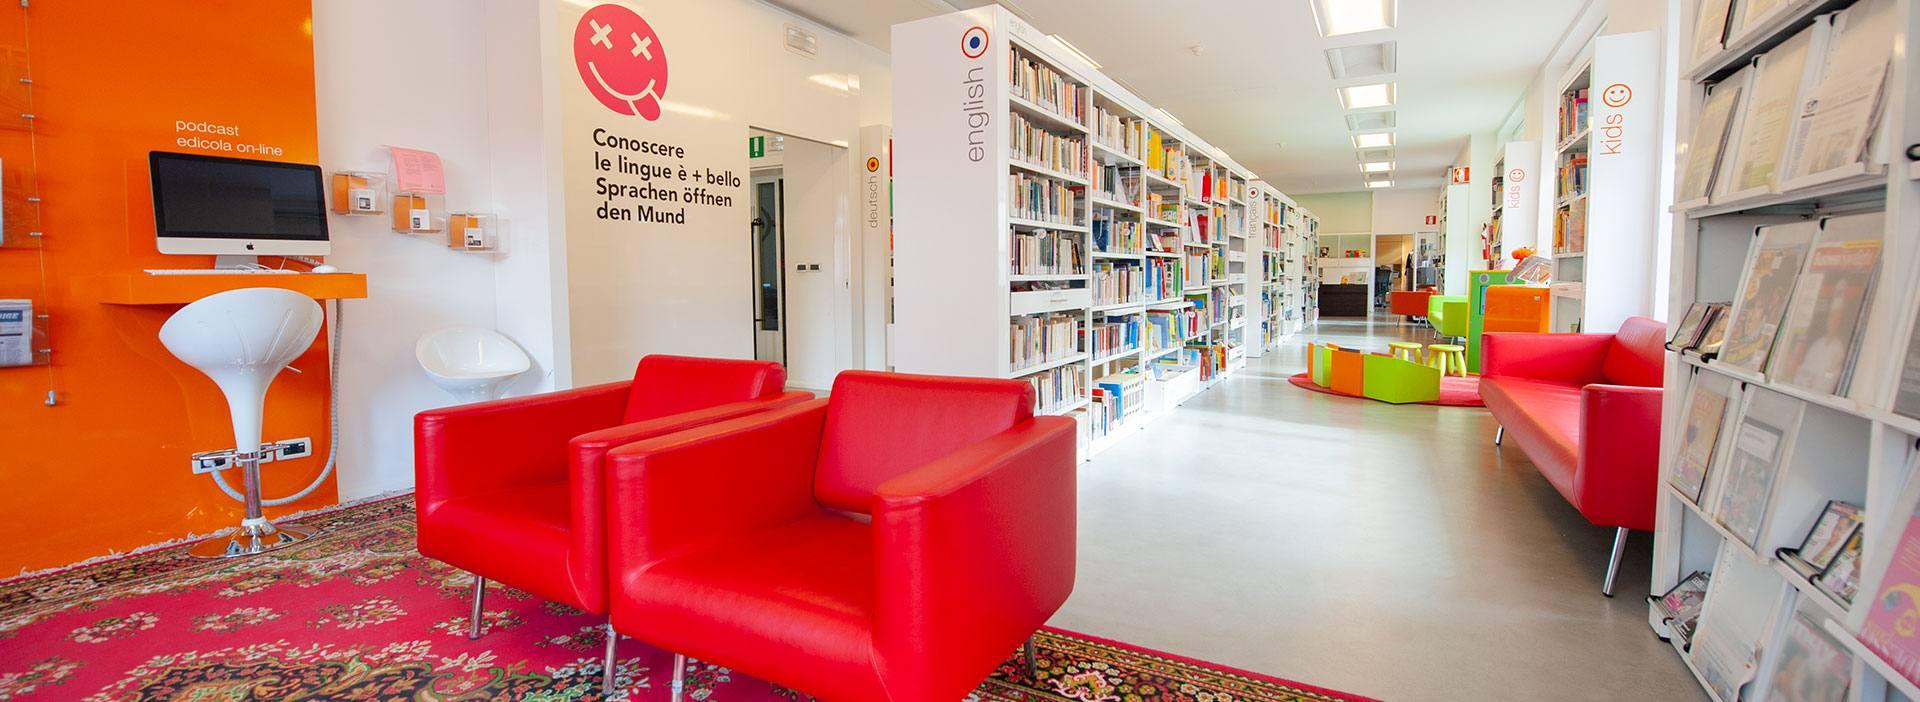 Mediathek Kulturzentrum Trevi